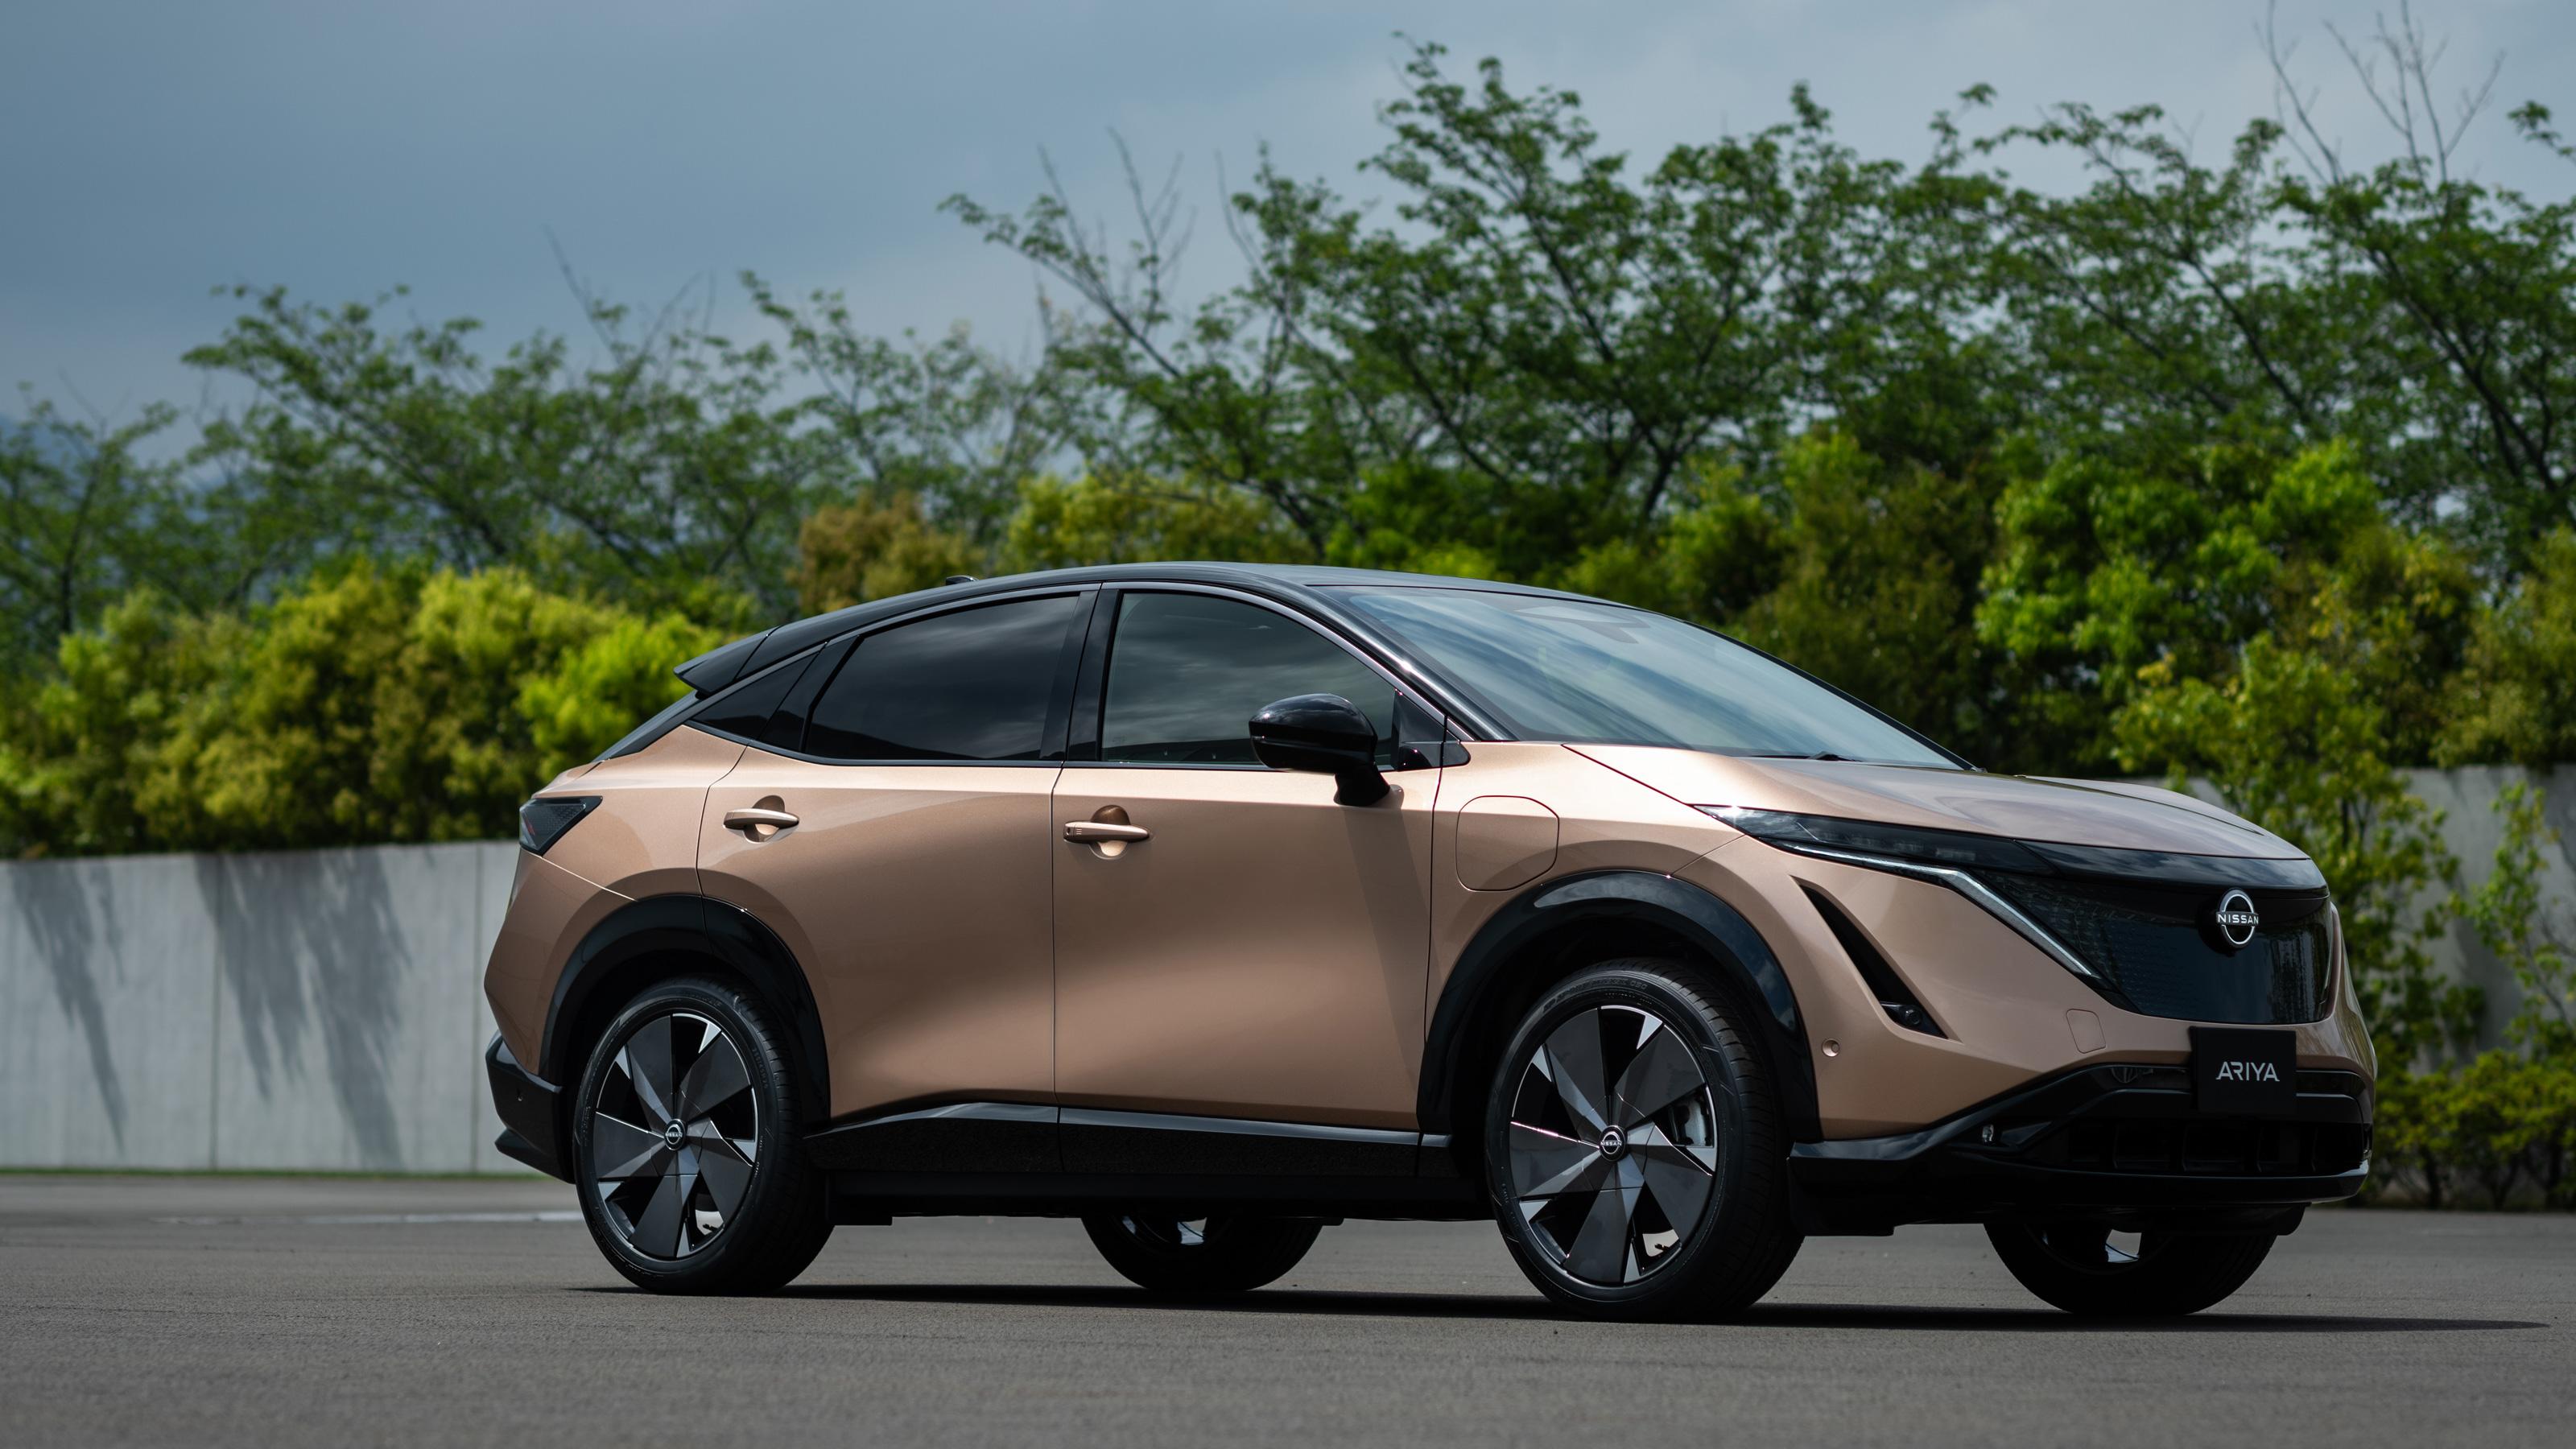 New Nissan Ariya electric SUV unveiled ahead of 2021 ...